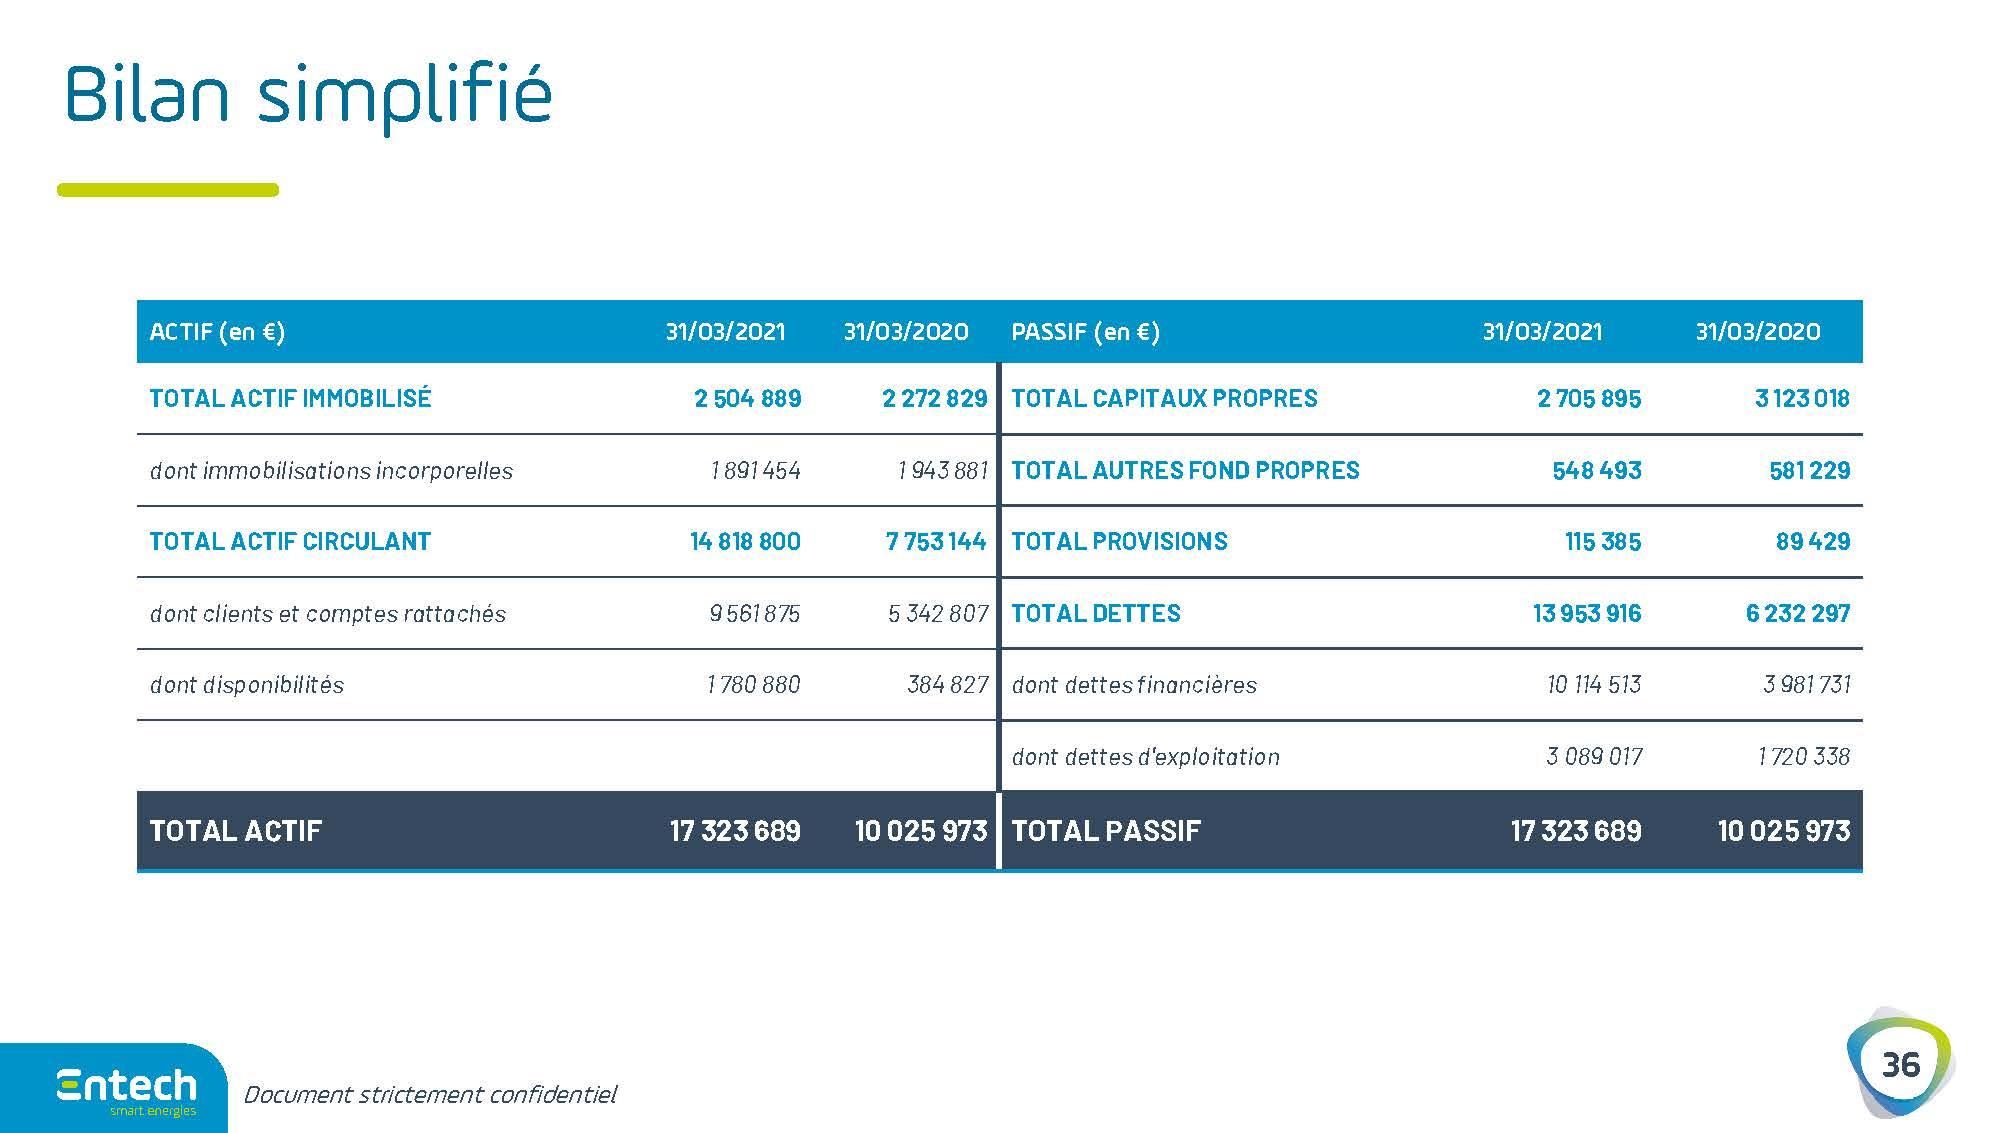 ENTECH_PRES_IPO_210914_FR_Page_36